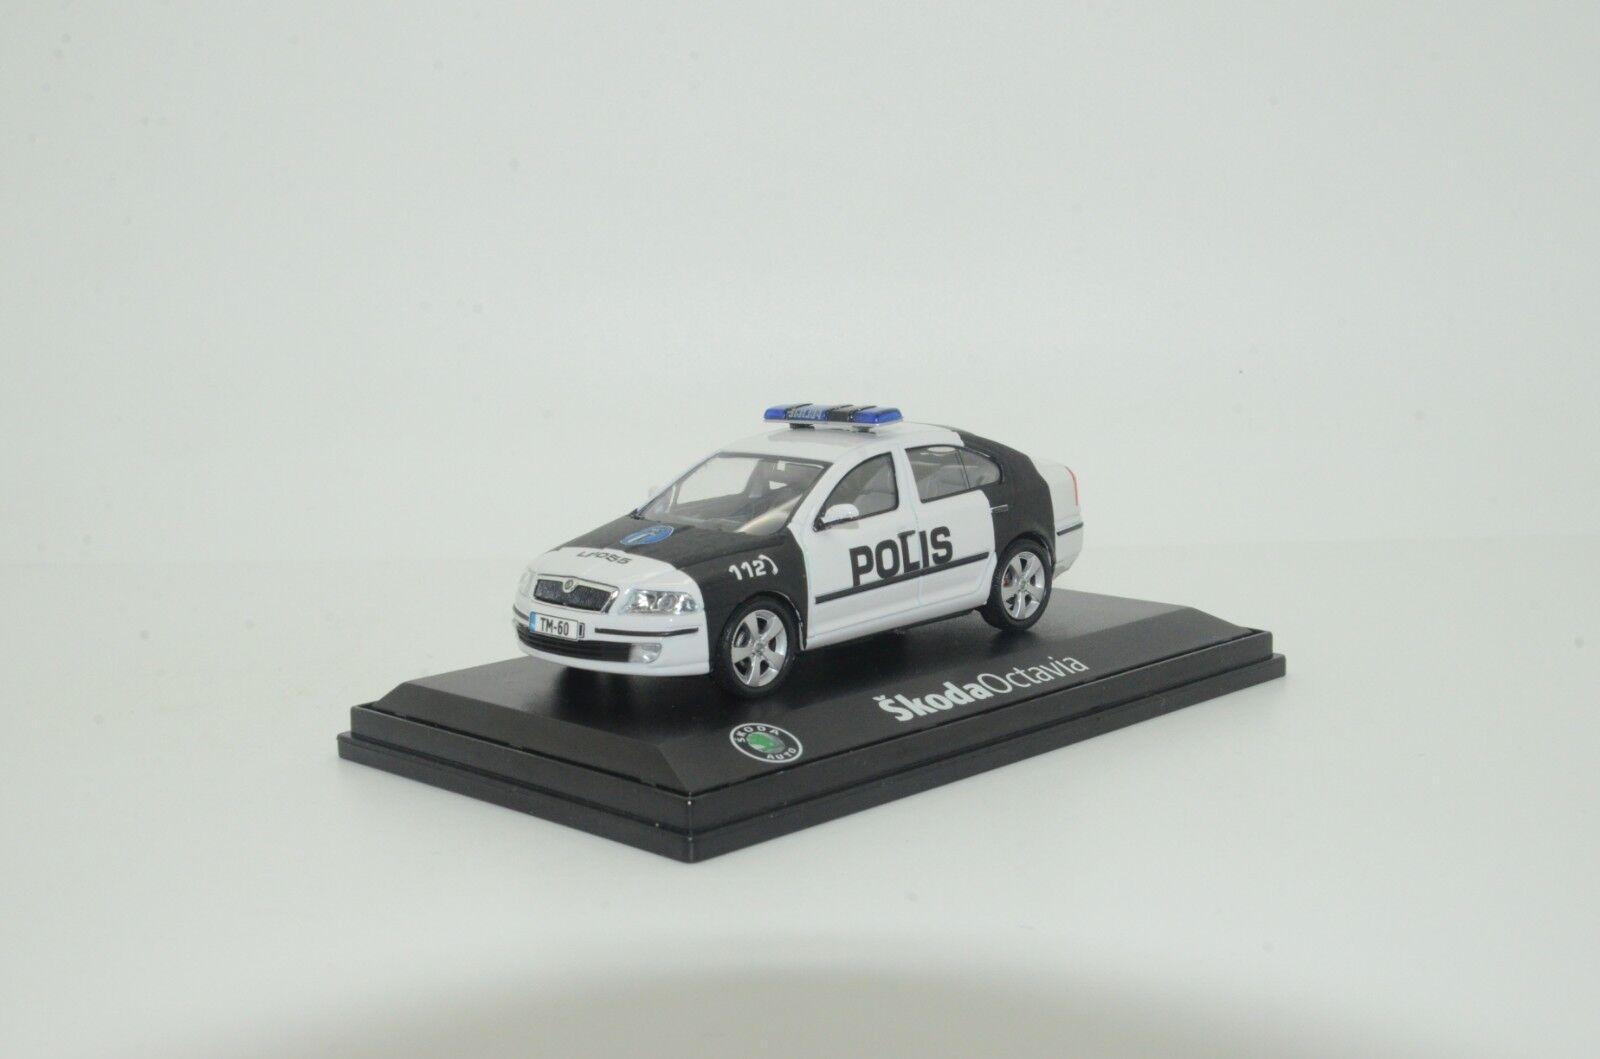 Rara Skoda Octavia II Finlandia polis policía Hecho a Medida 1 43